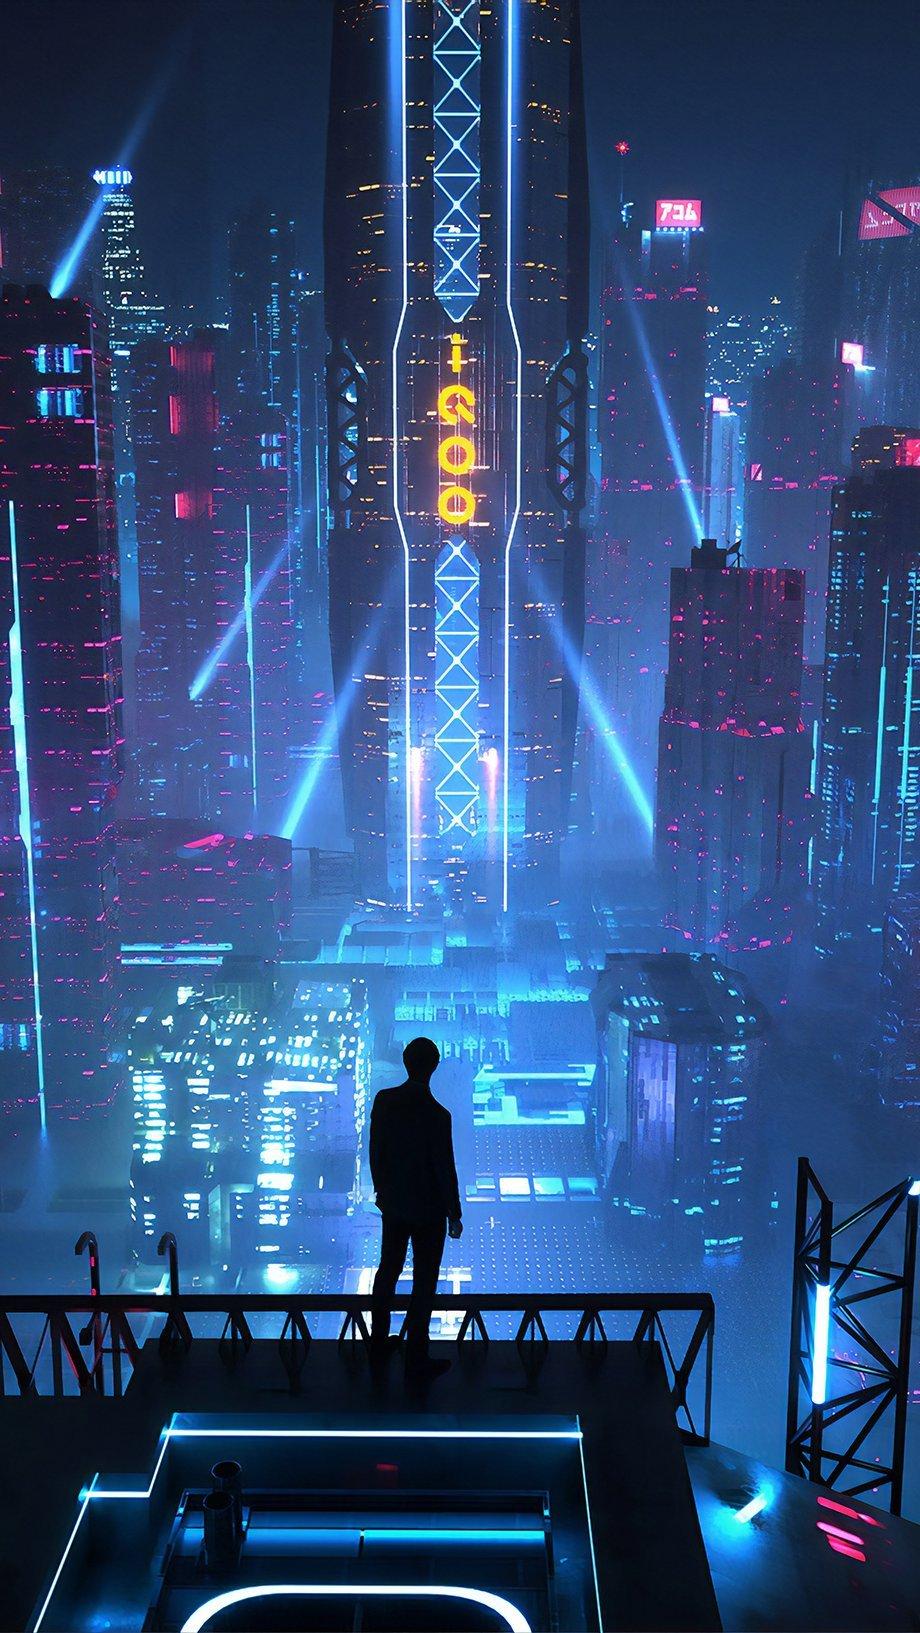 Wallpaper Buildings City at night Vertical